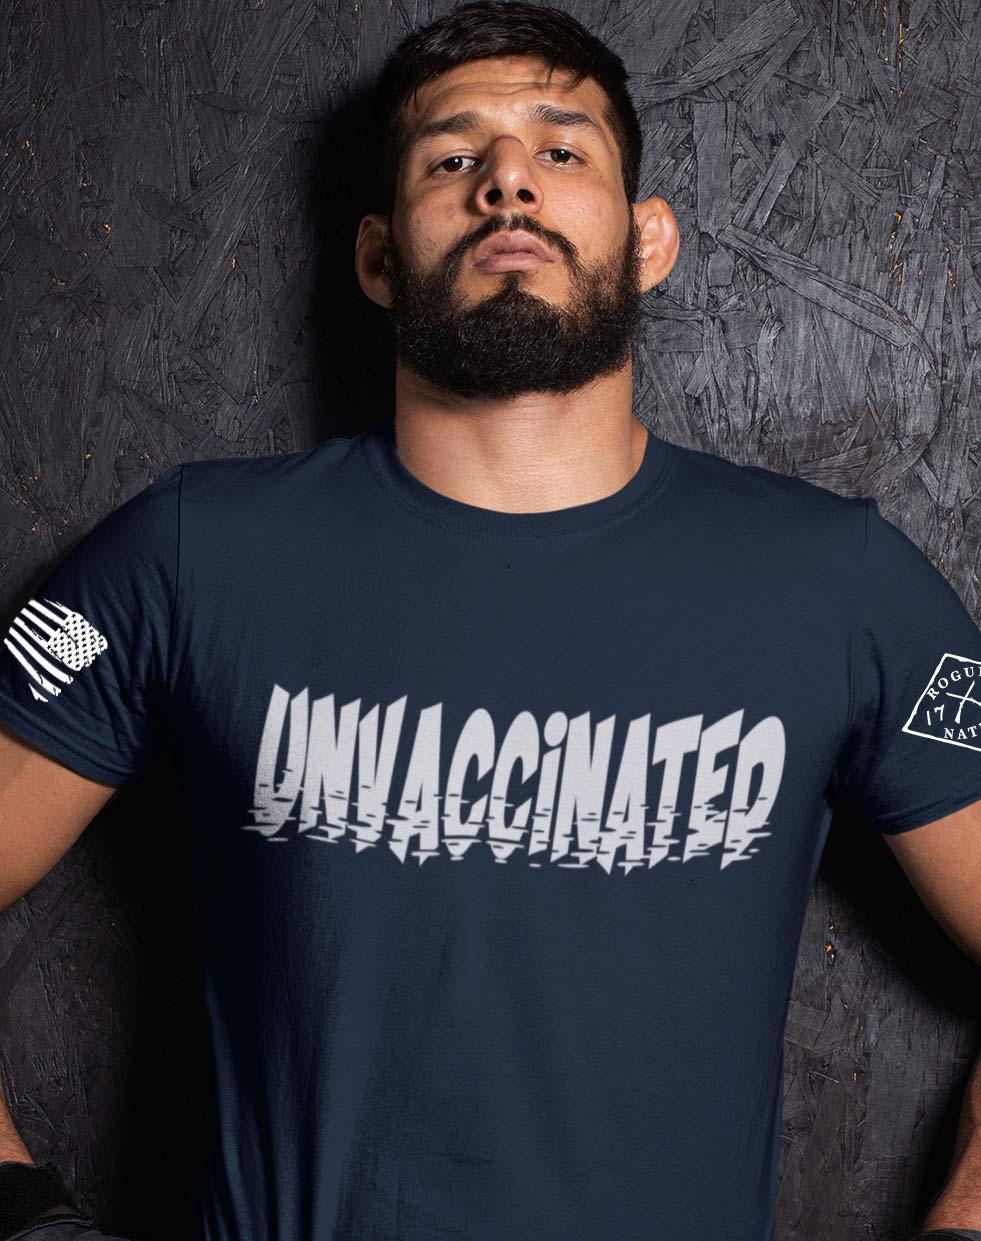 Unvaccinated T-shirt Men's